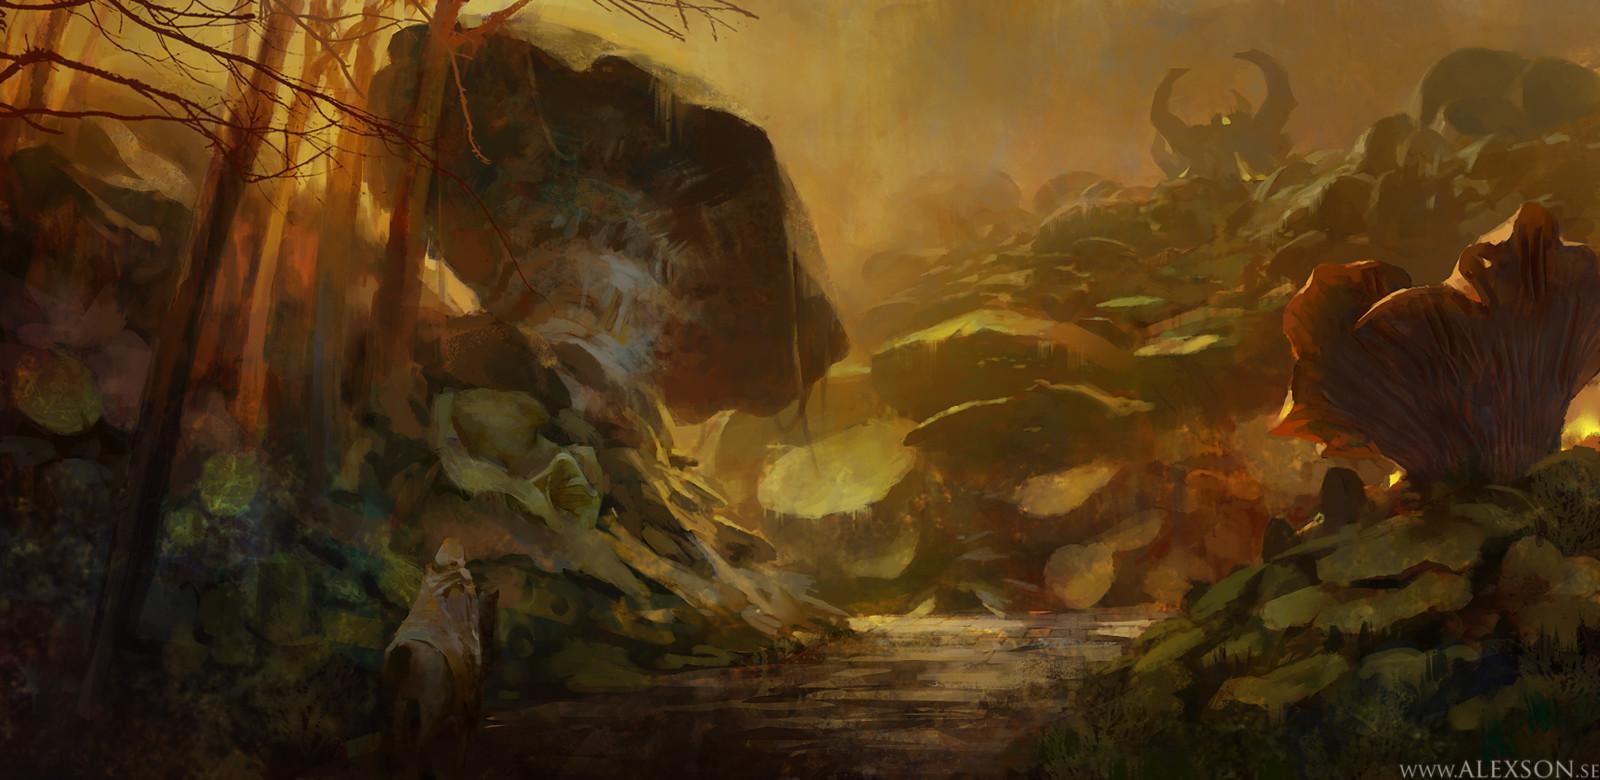 The plaguelands